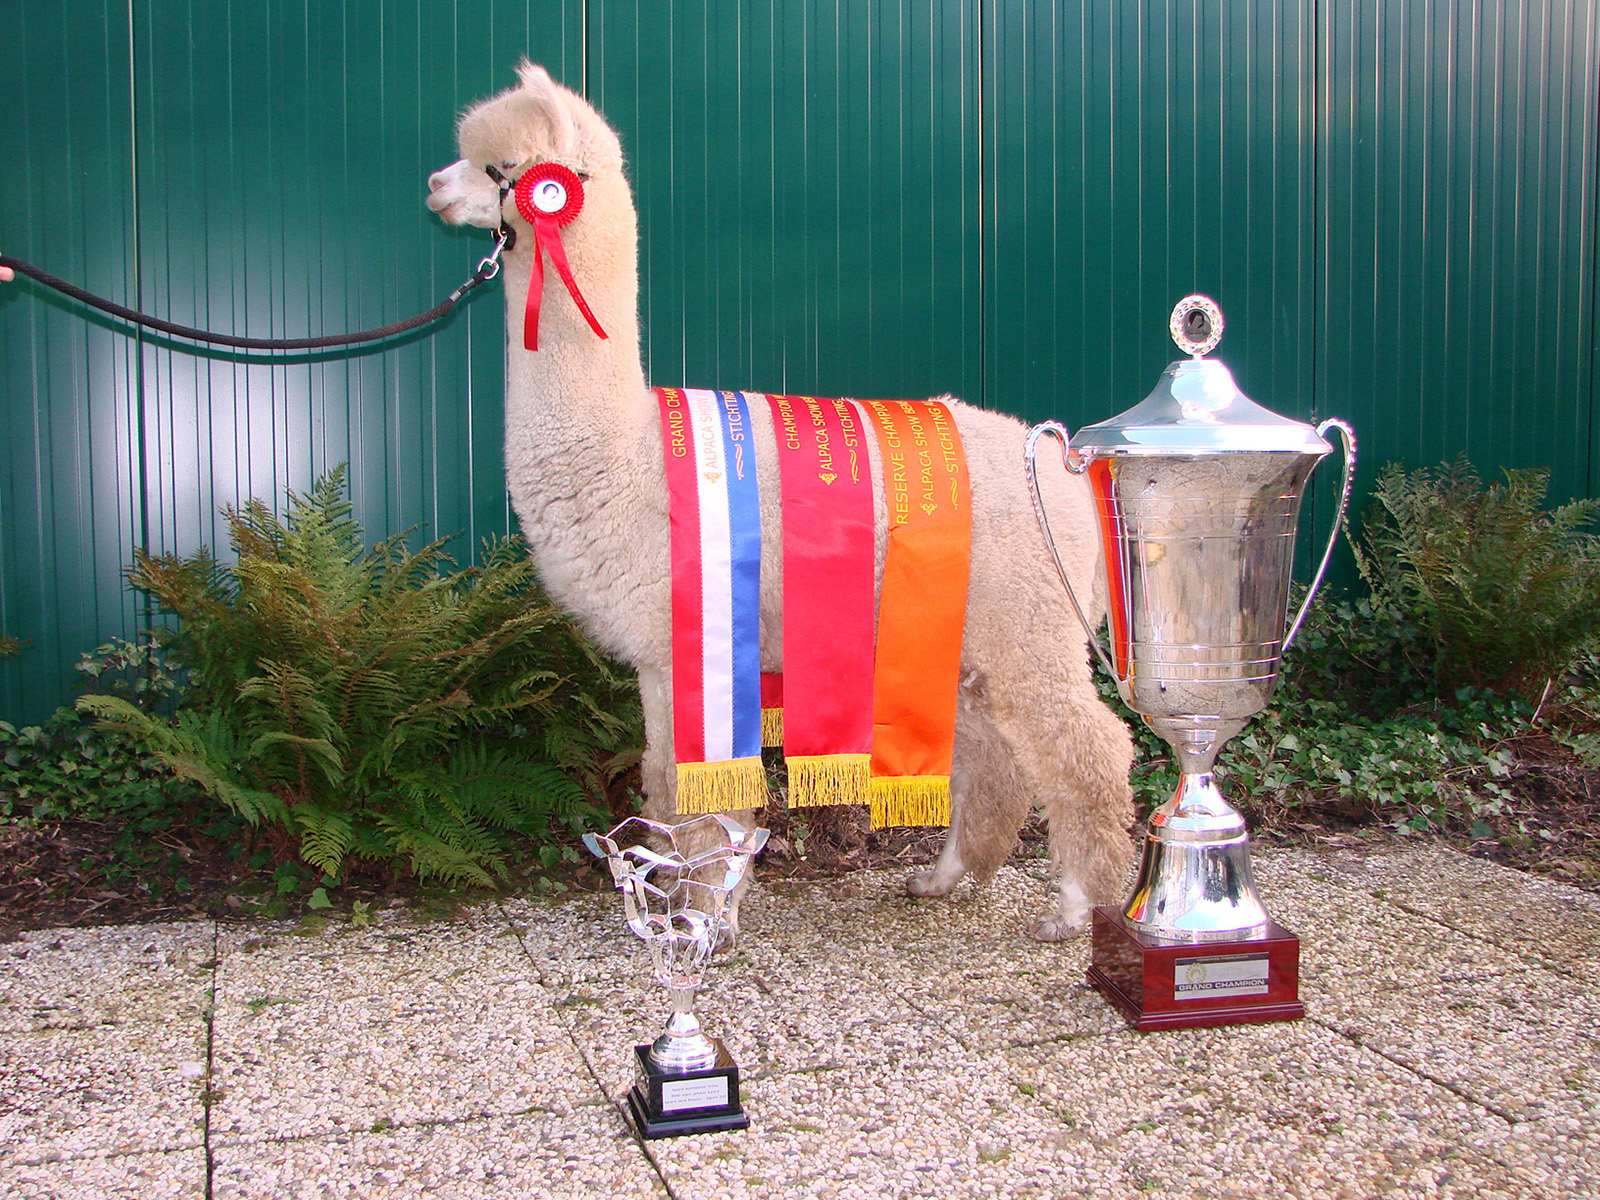 Alpaca-World-Brielle fokkerij raszuivere Alpaca's biozuiger alpacawandeling